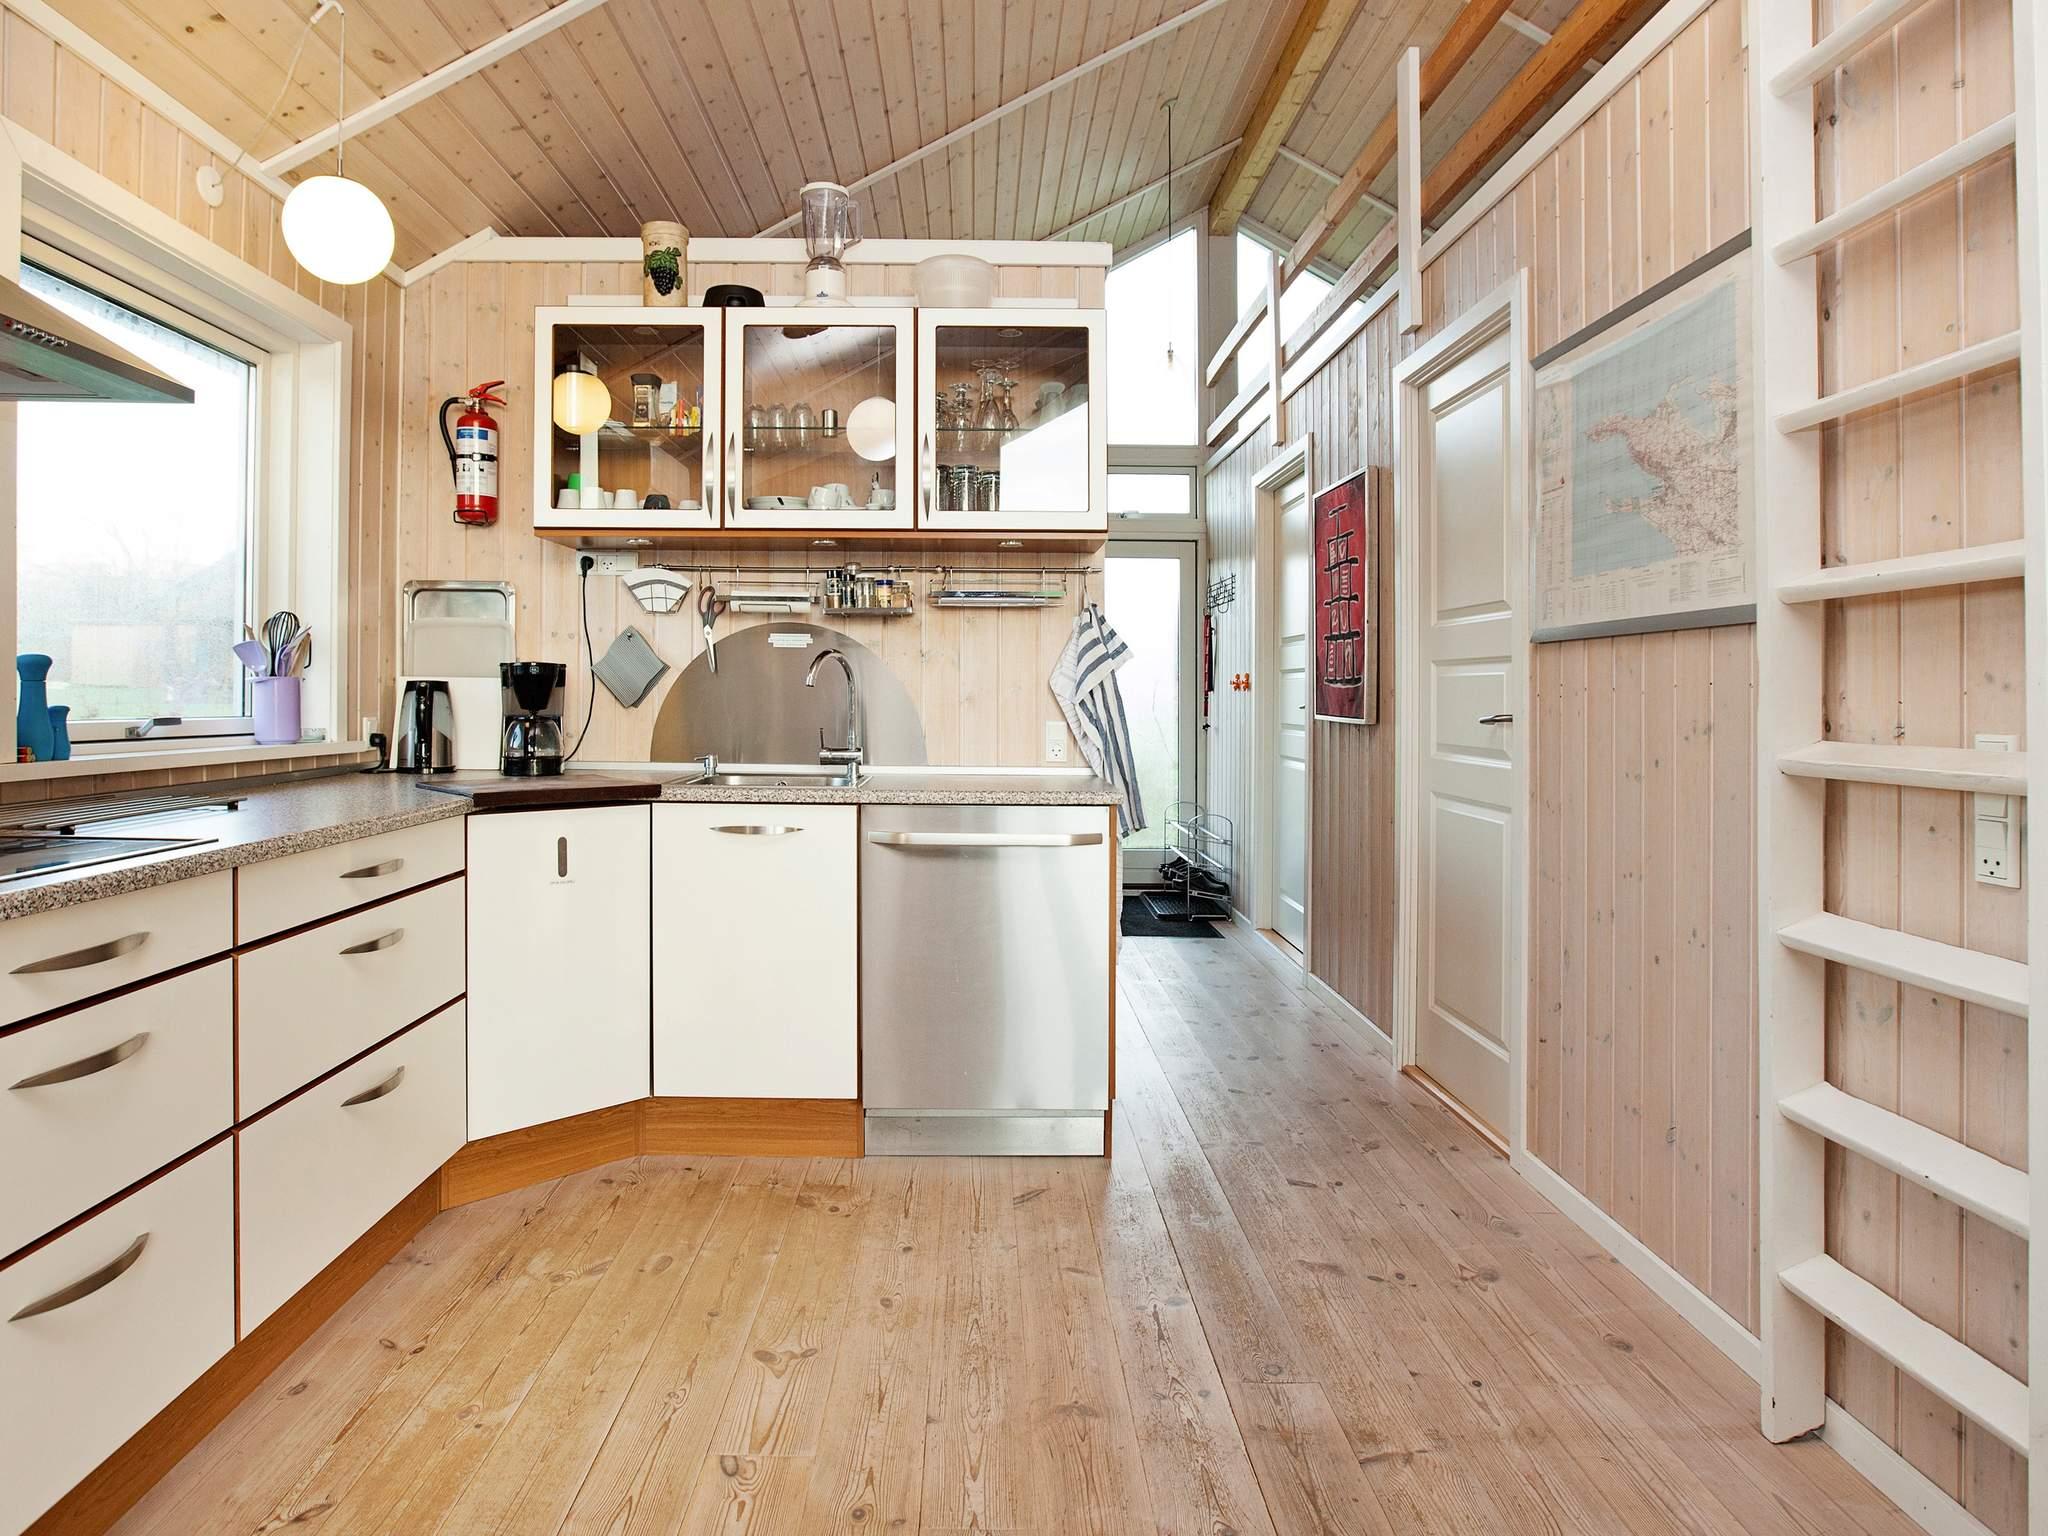 Ferienhaus Røsnæs (488905), Kalundborg, , Westseeland, Dänemark, Bild 4